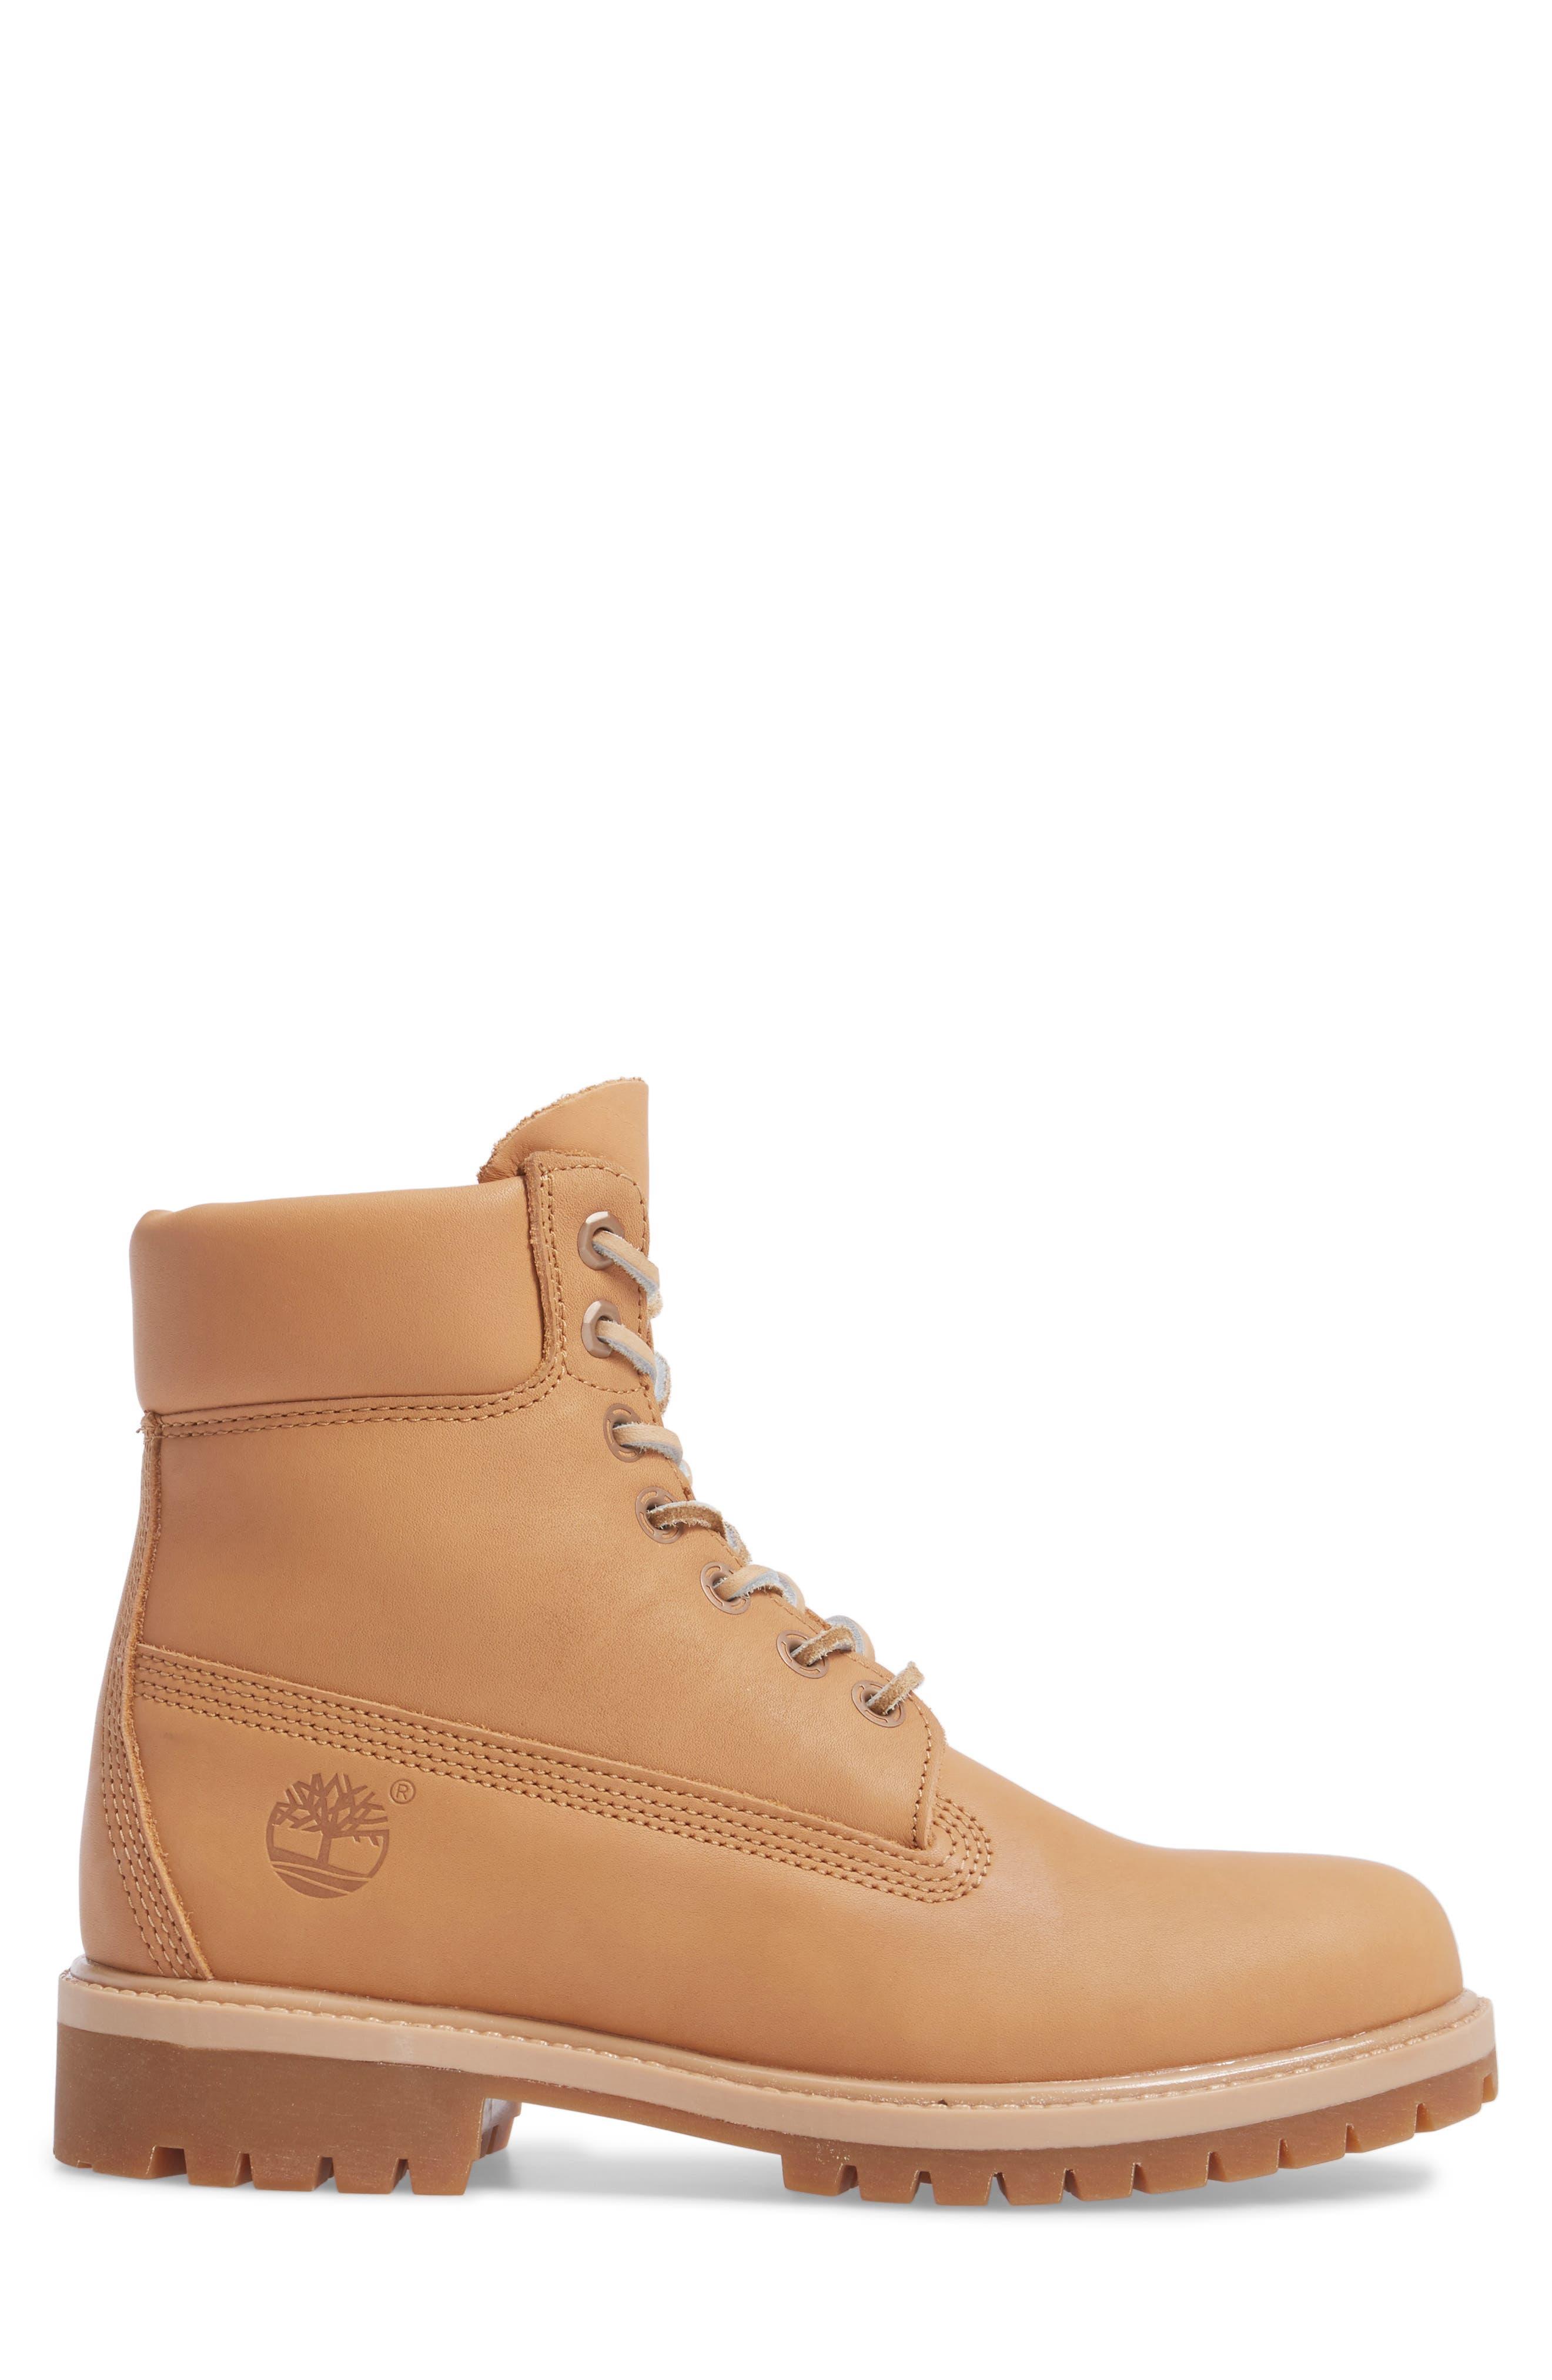 Premium Waterproof Plain Toe Boot,                             Alternate thumbnail 3, color,                             Natural Leather